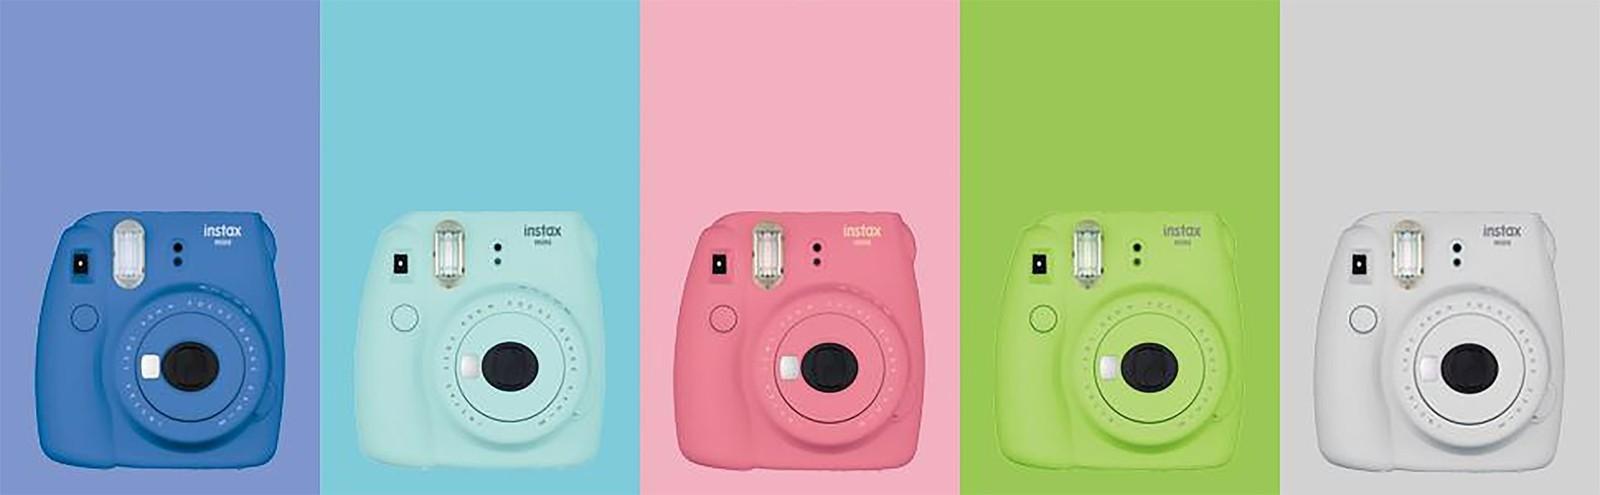 instax-mini-camera-line-01